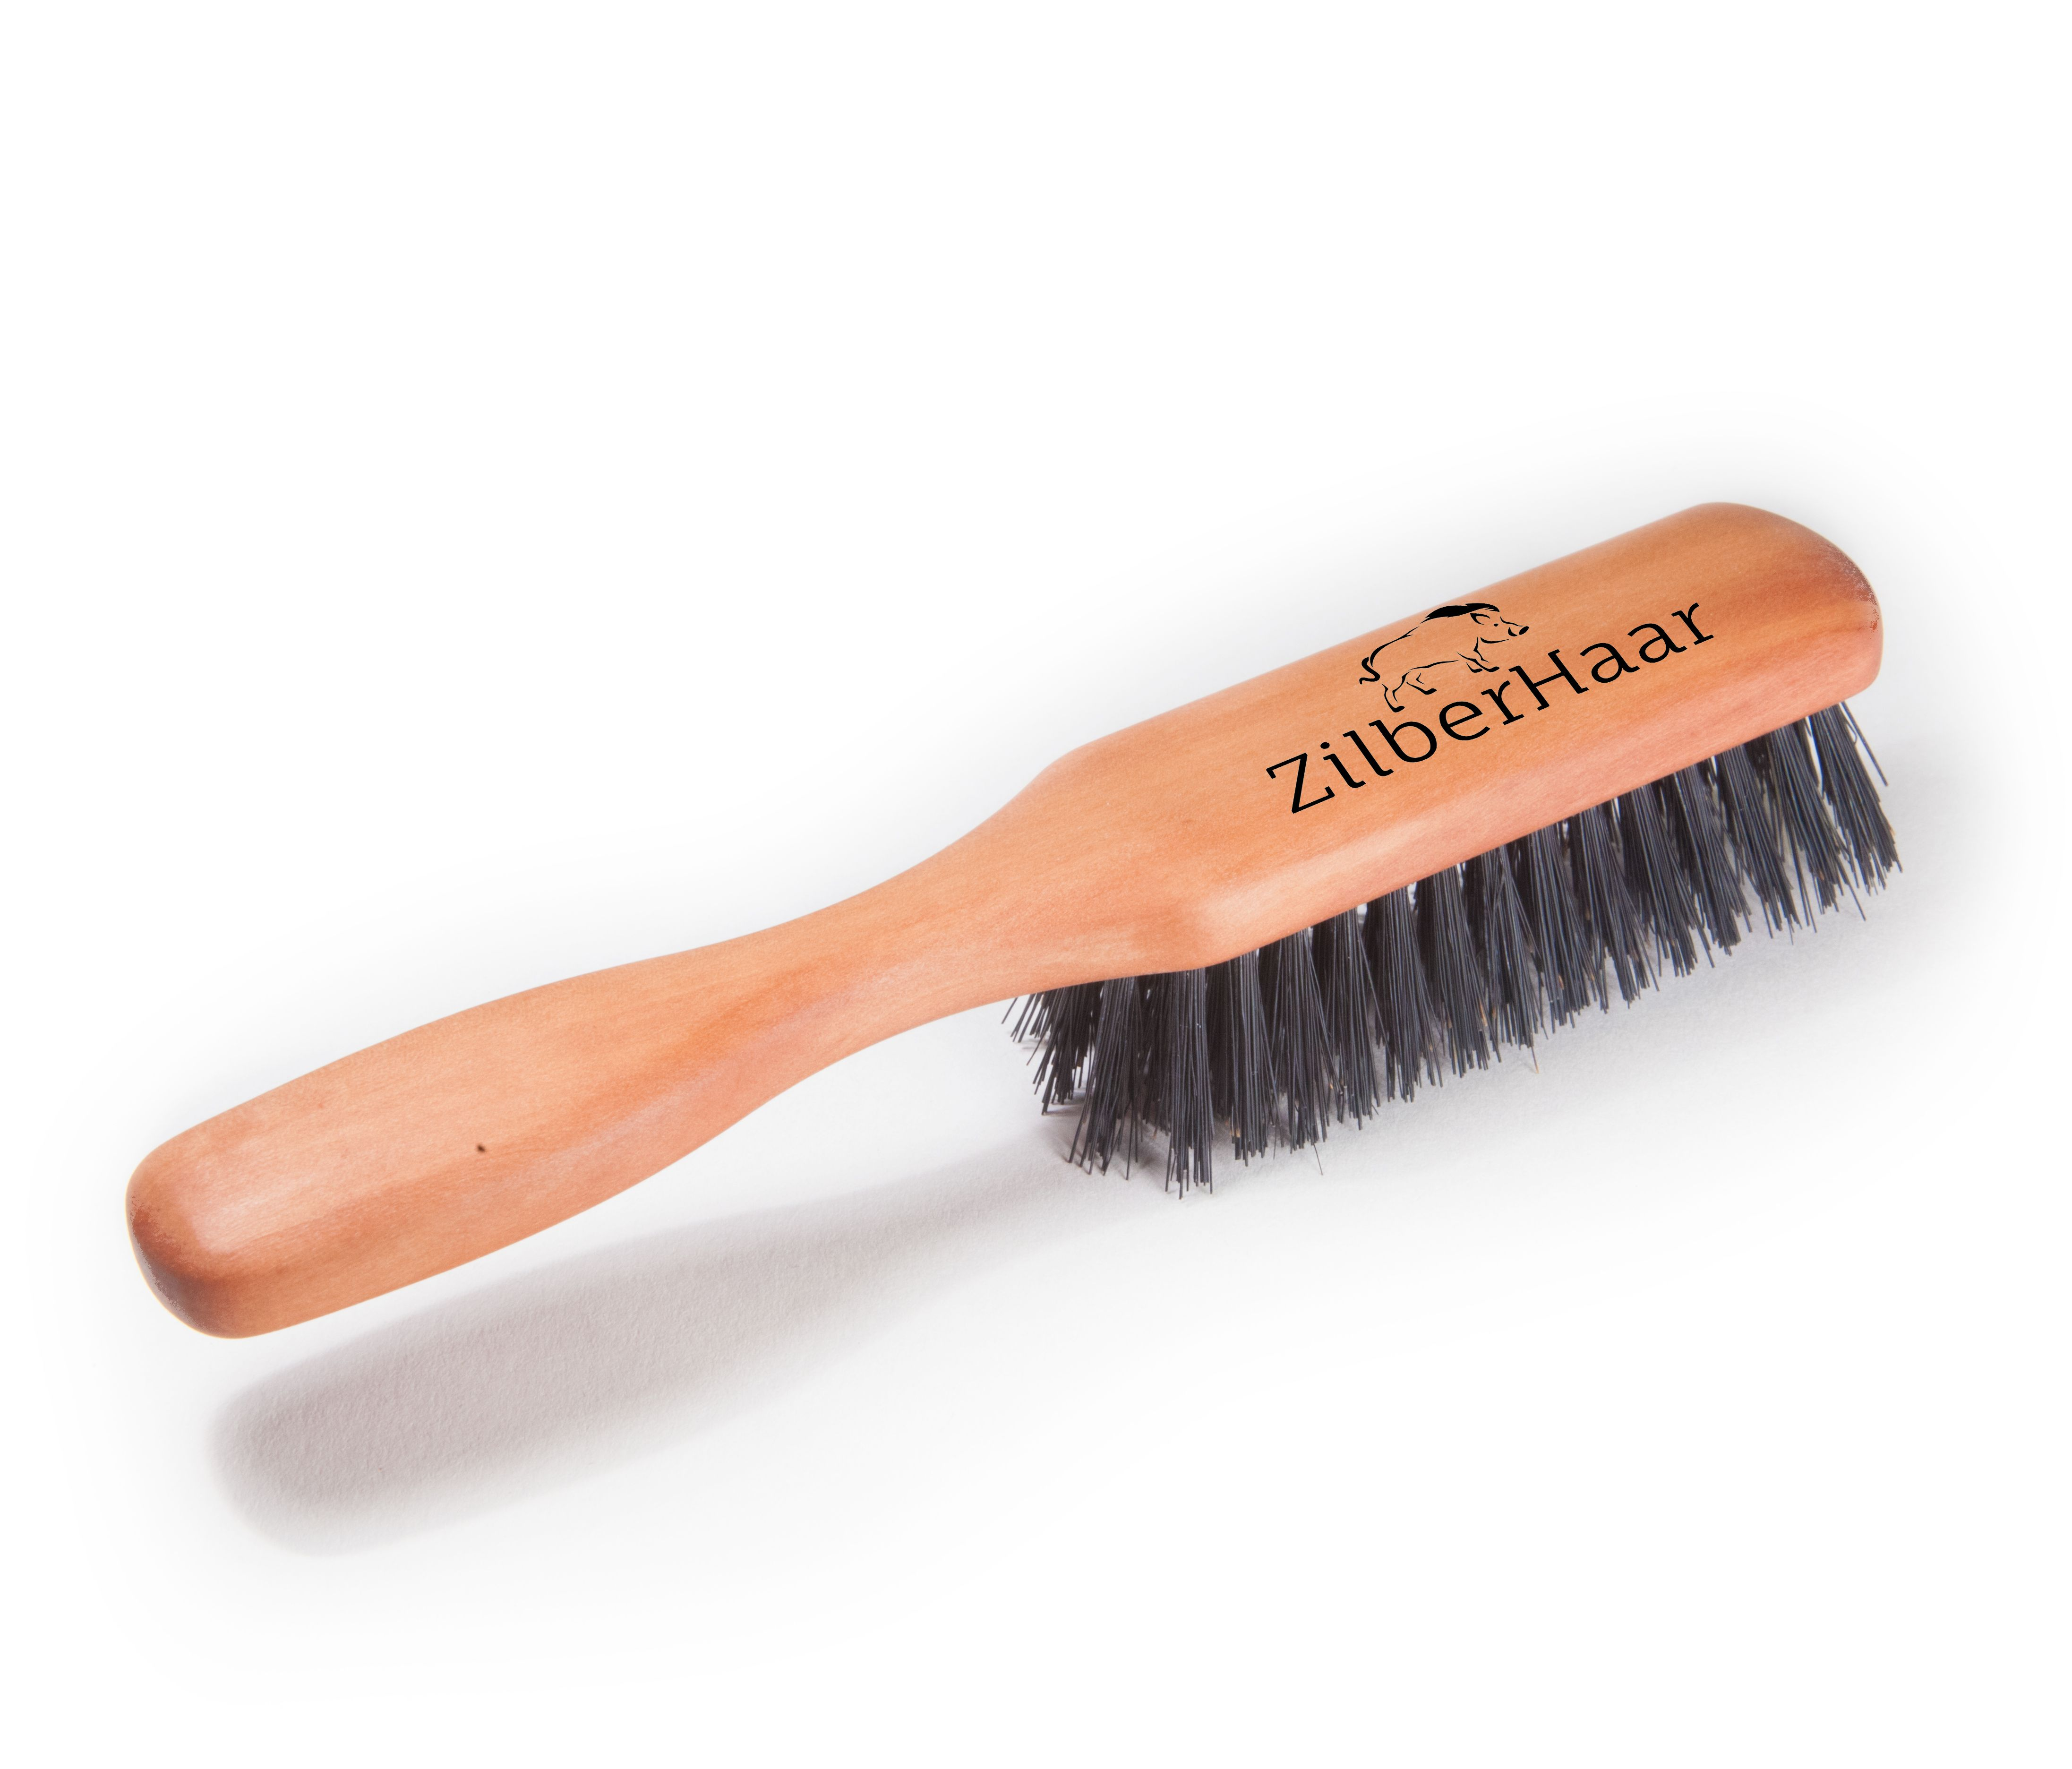 Zilberhaar Beard Brush, exquisite brush for every day use